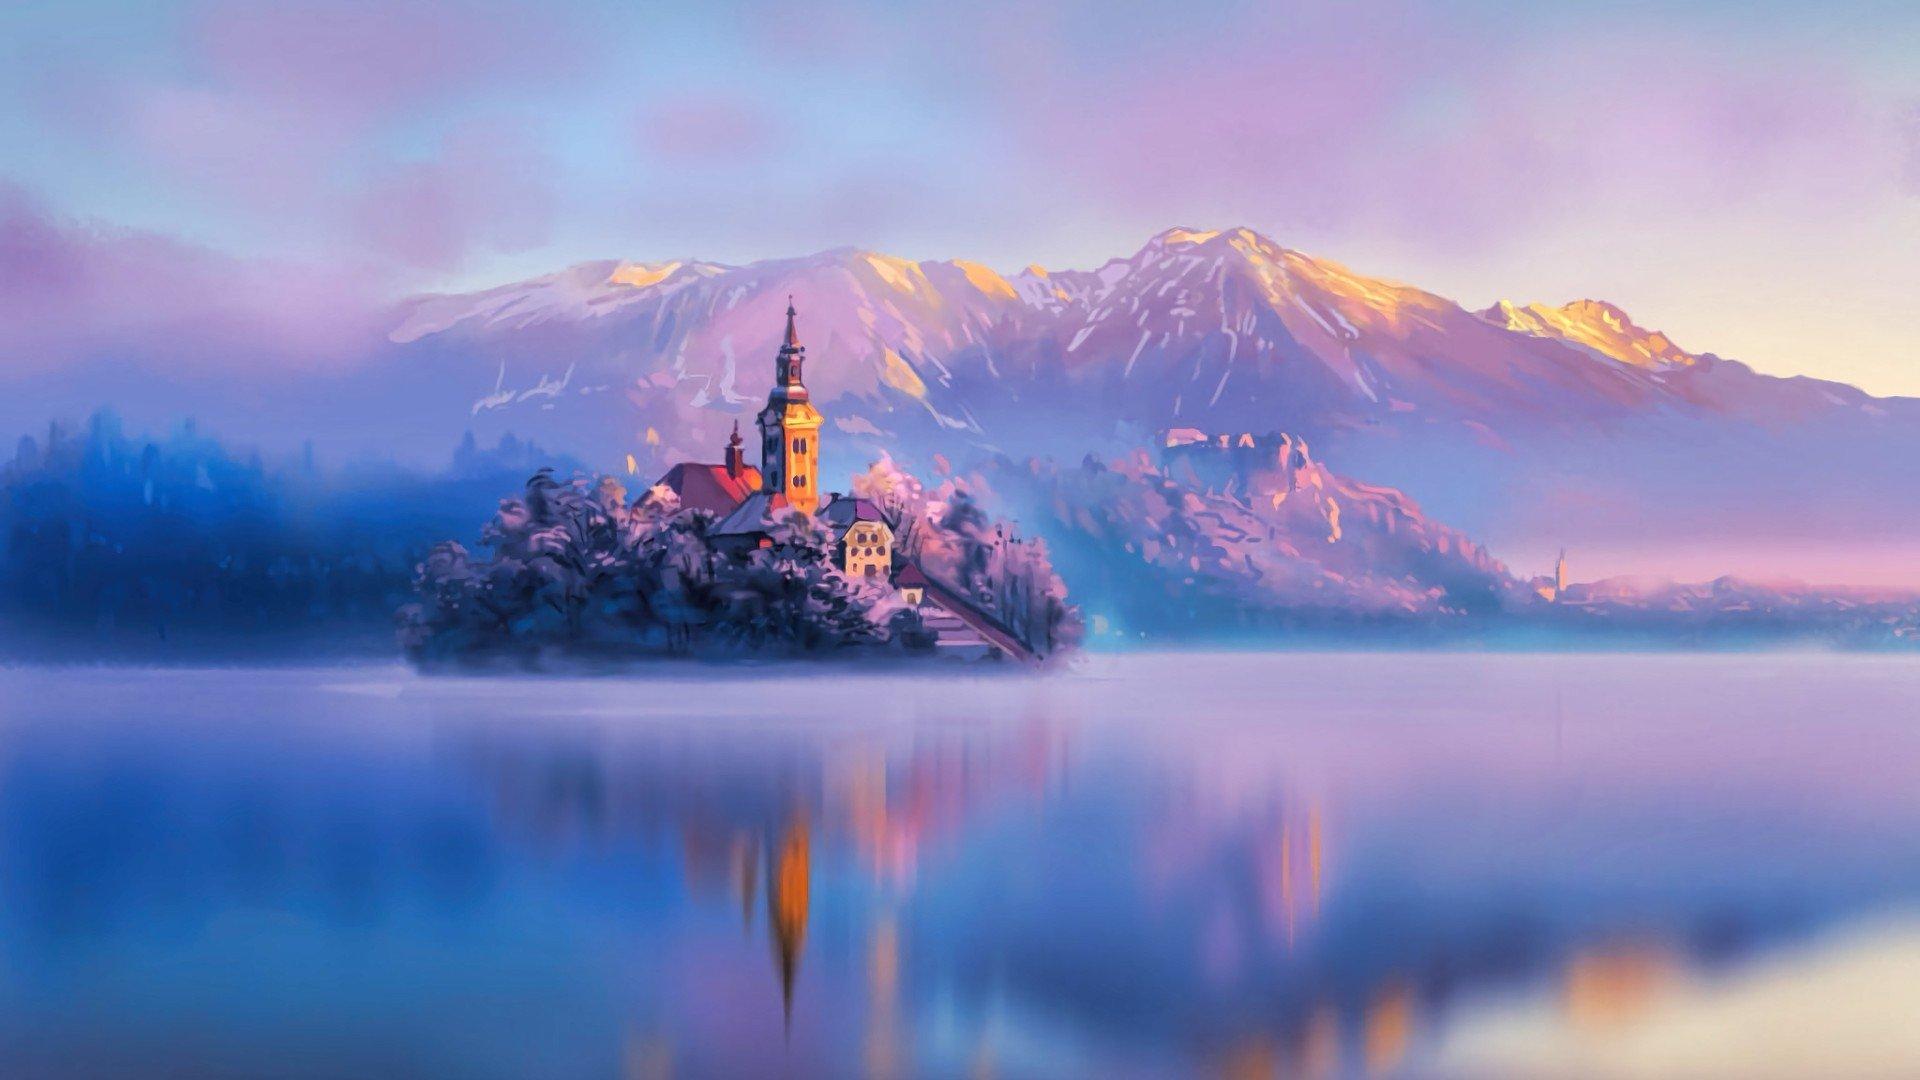 Religious - Assumption of Mary Church  Cloud Fog Mountain Slovenia Sunrise Winter Lake Artistic Wallpaper